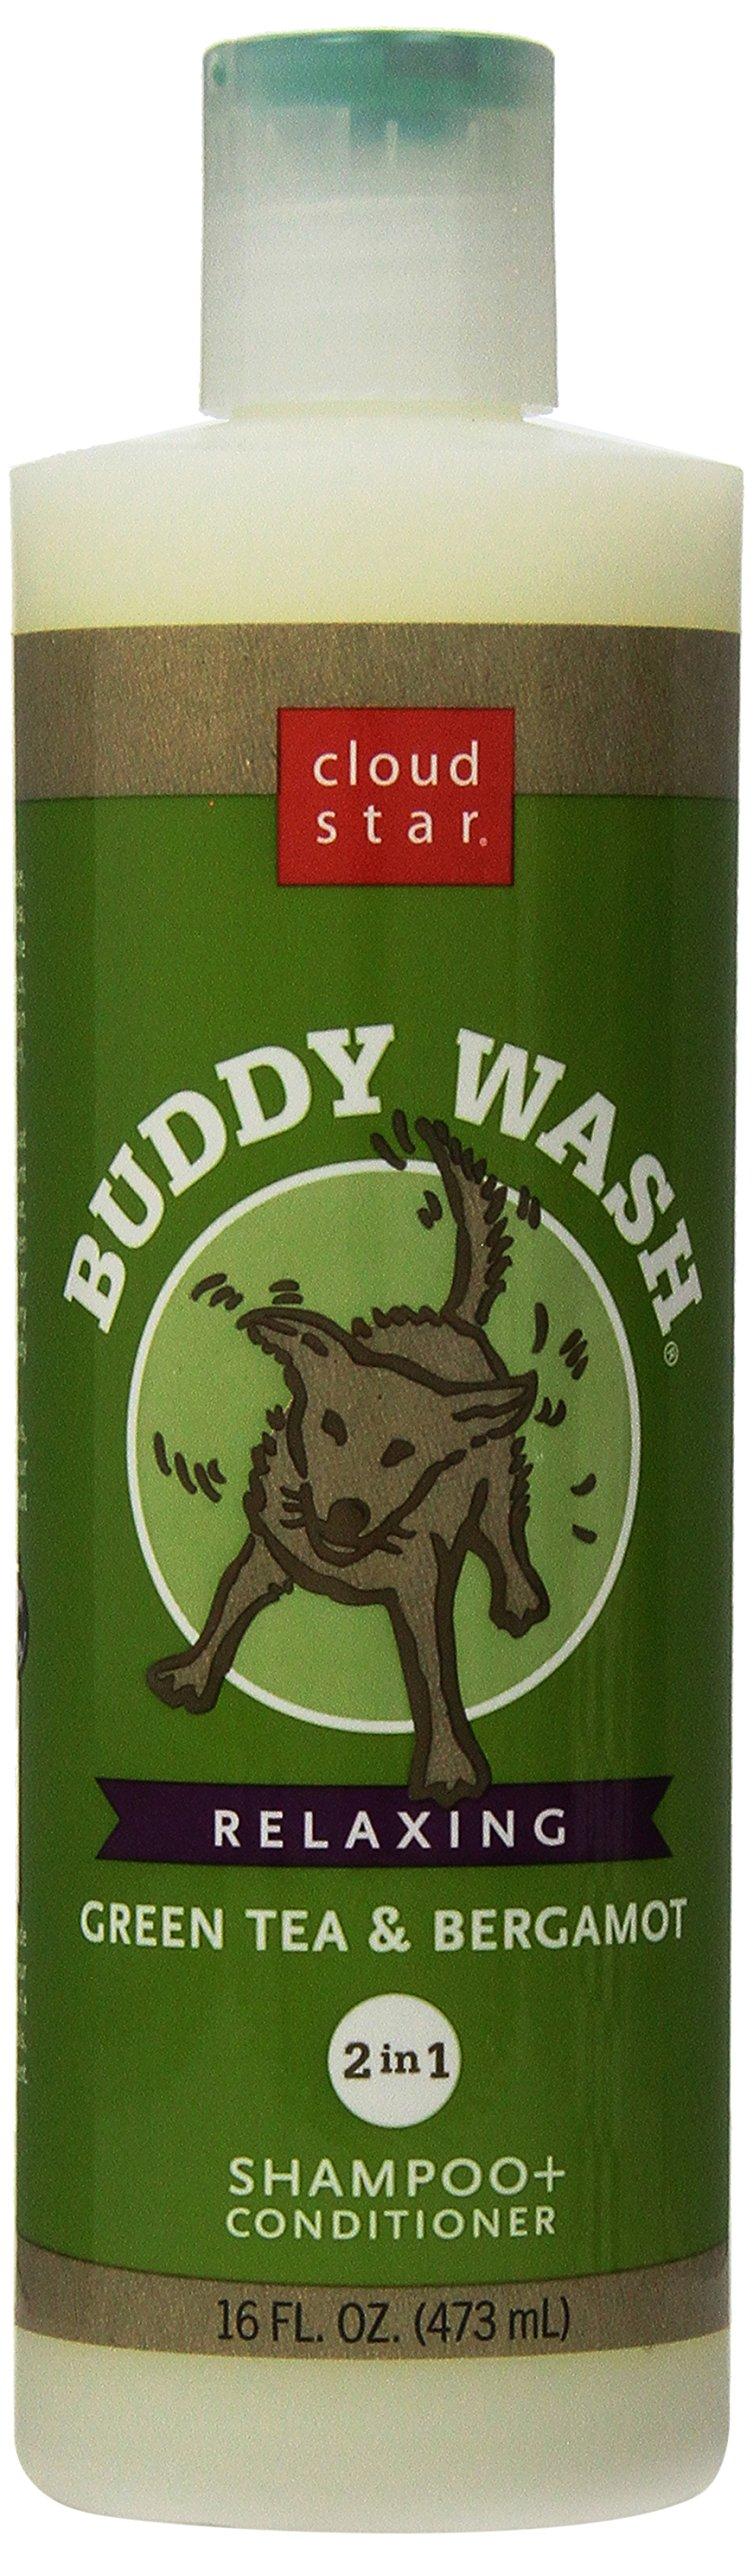 Cloud Star Buddy Wash Dog Shampoo- Green Tea And Bergamot, 16-Ounce Bottles (Pack Of 3)